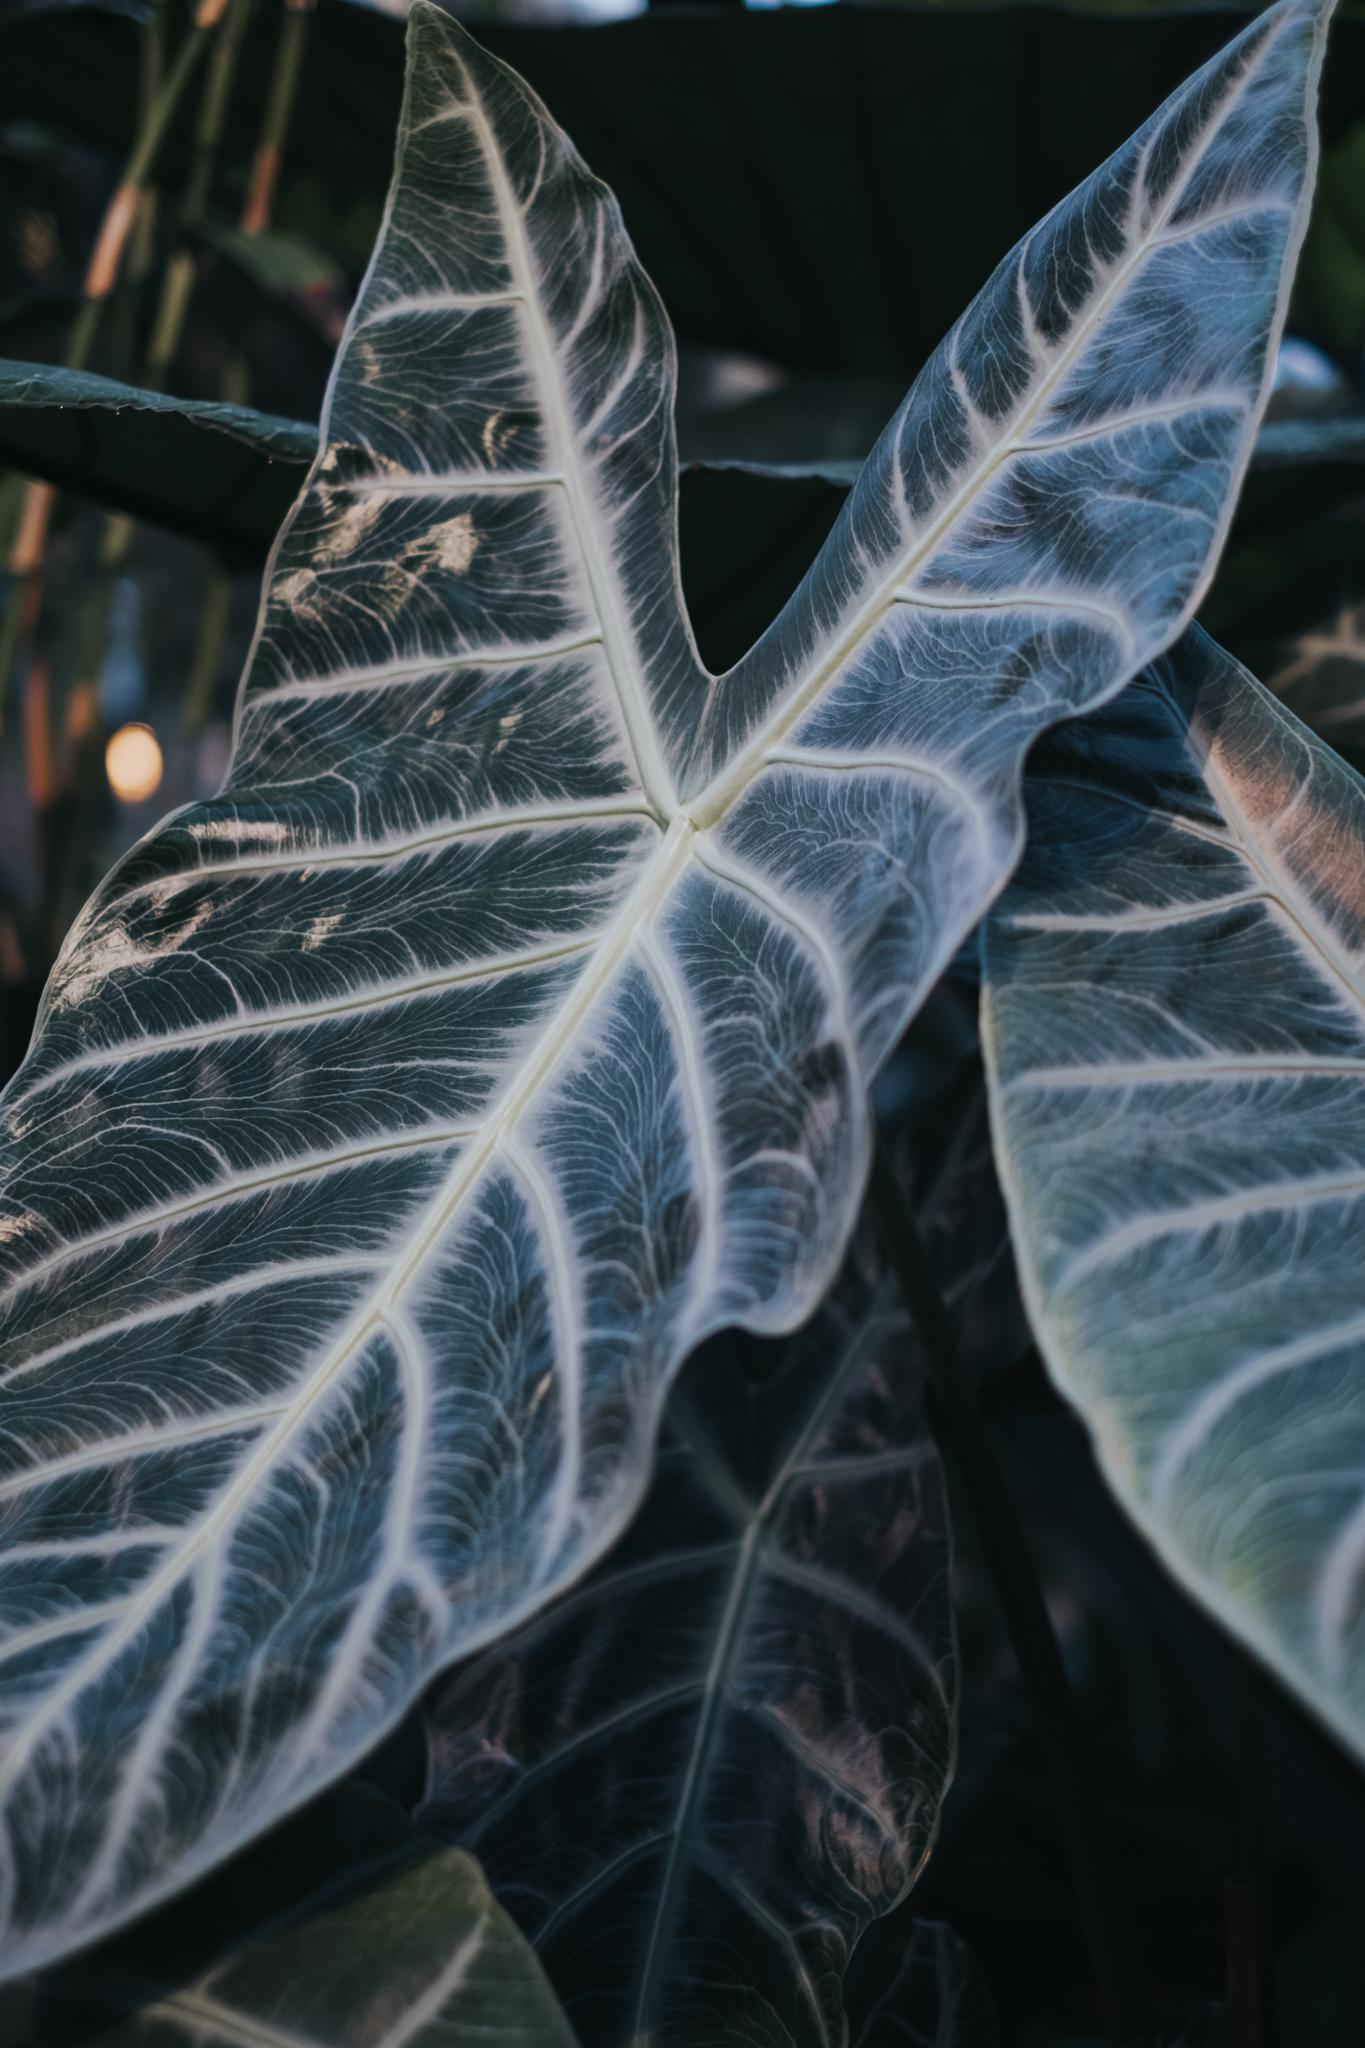 ellamackphotos_Cynthia_plants-3.jpg